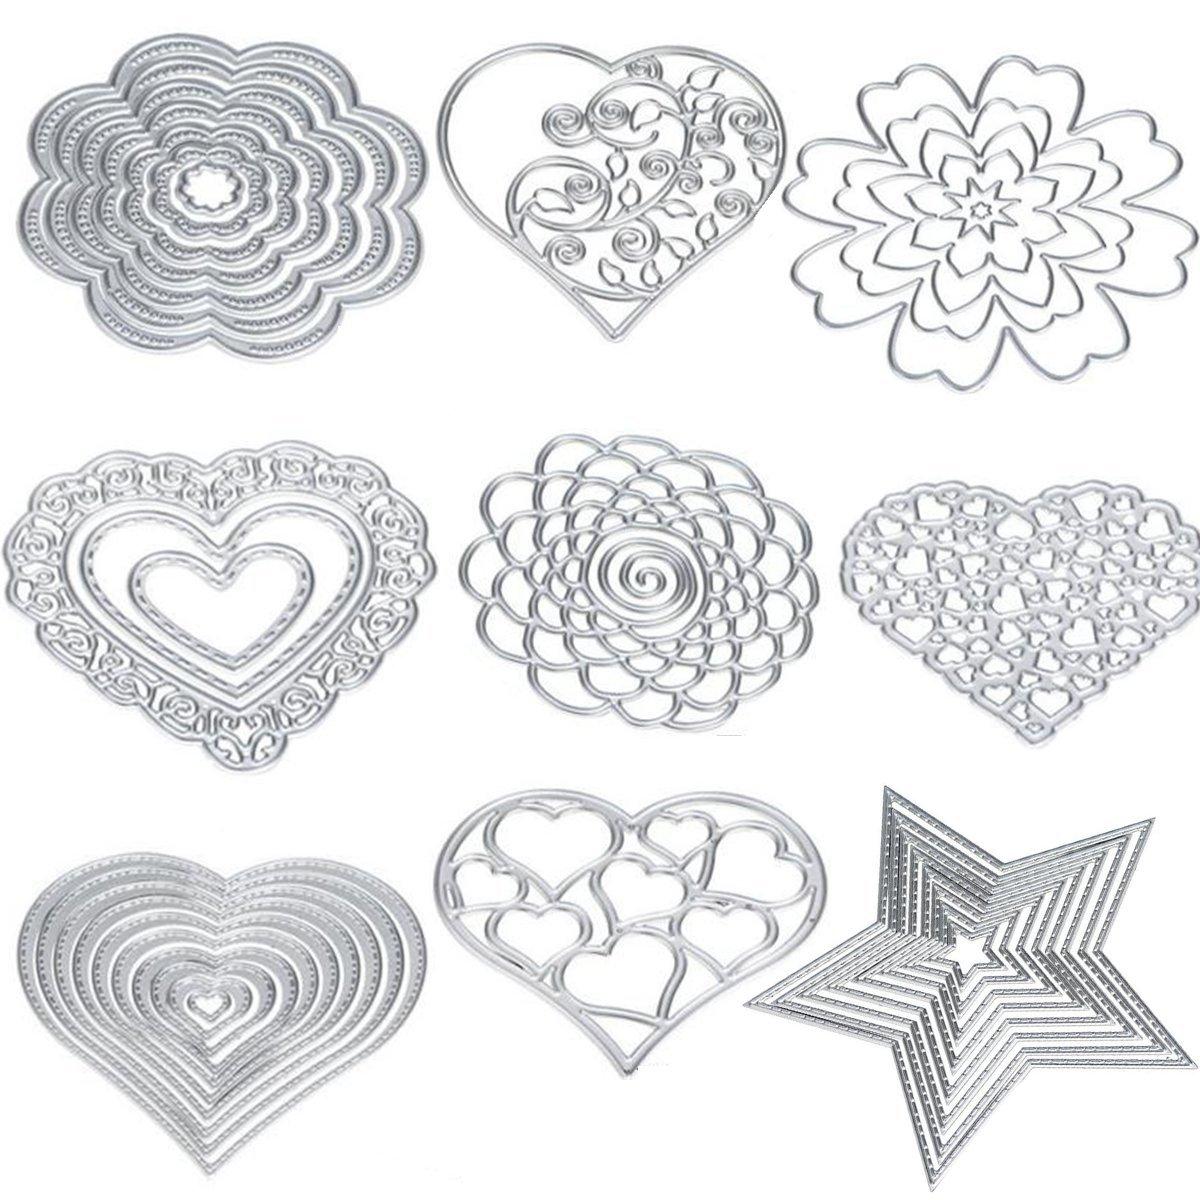 Cutting Dies Cut Metal Scrapbooking Love Heart Square Flower Star Sunflower Stencils Nesting Die for DIY Embossing Photo Album Decorative DIY Paper Cards Making Craft 9set (Set 5)